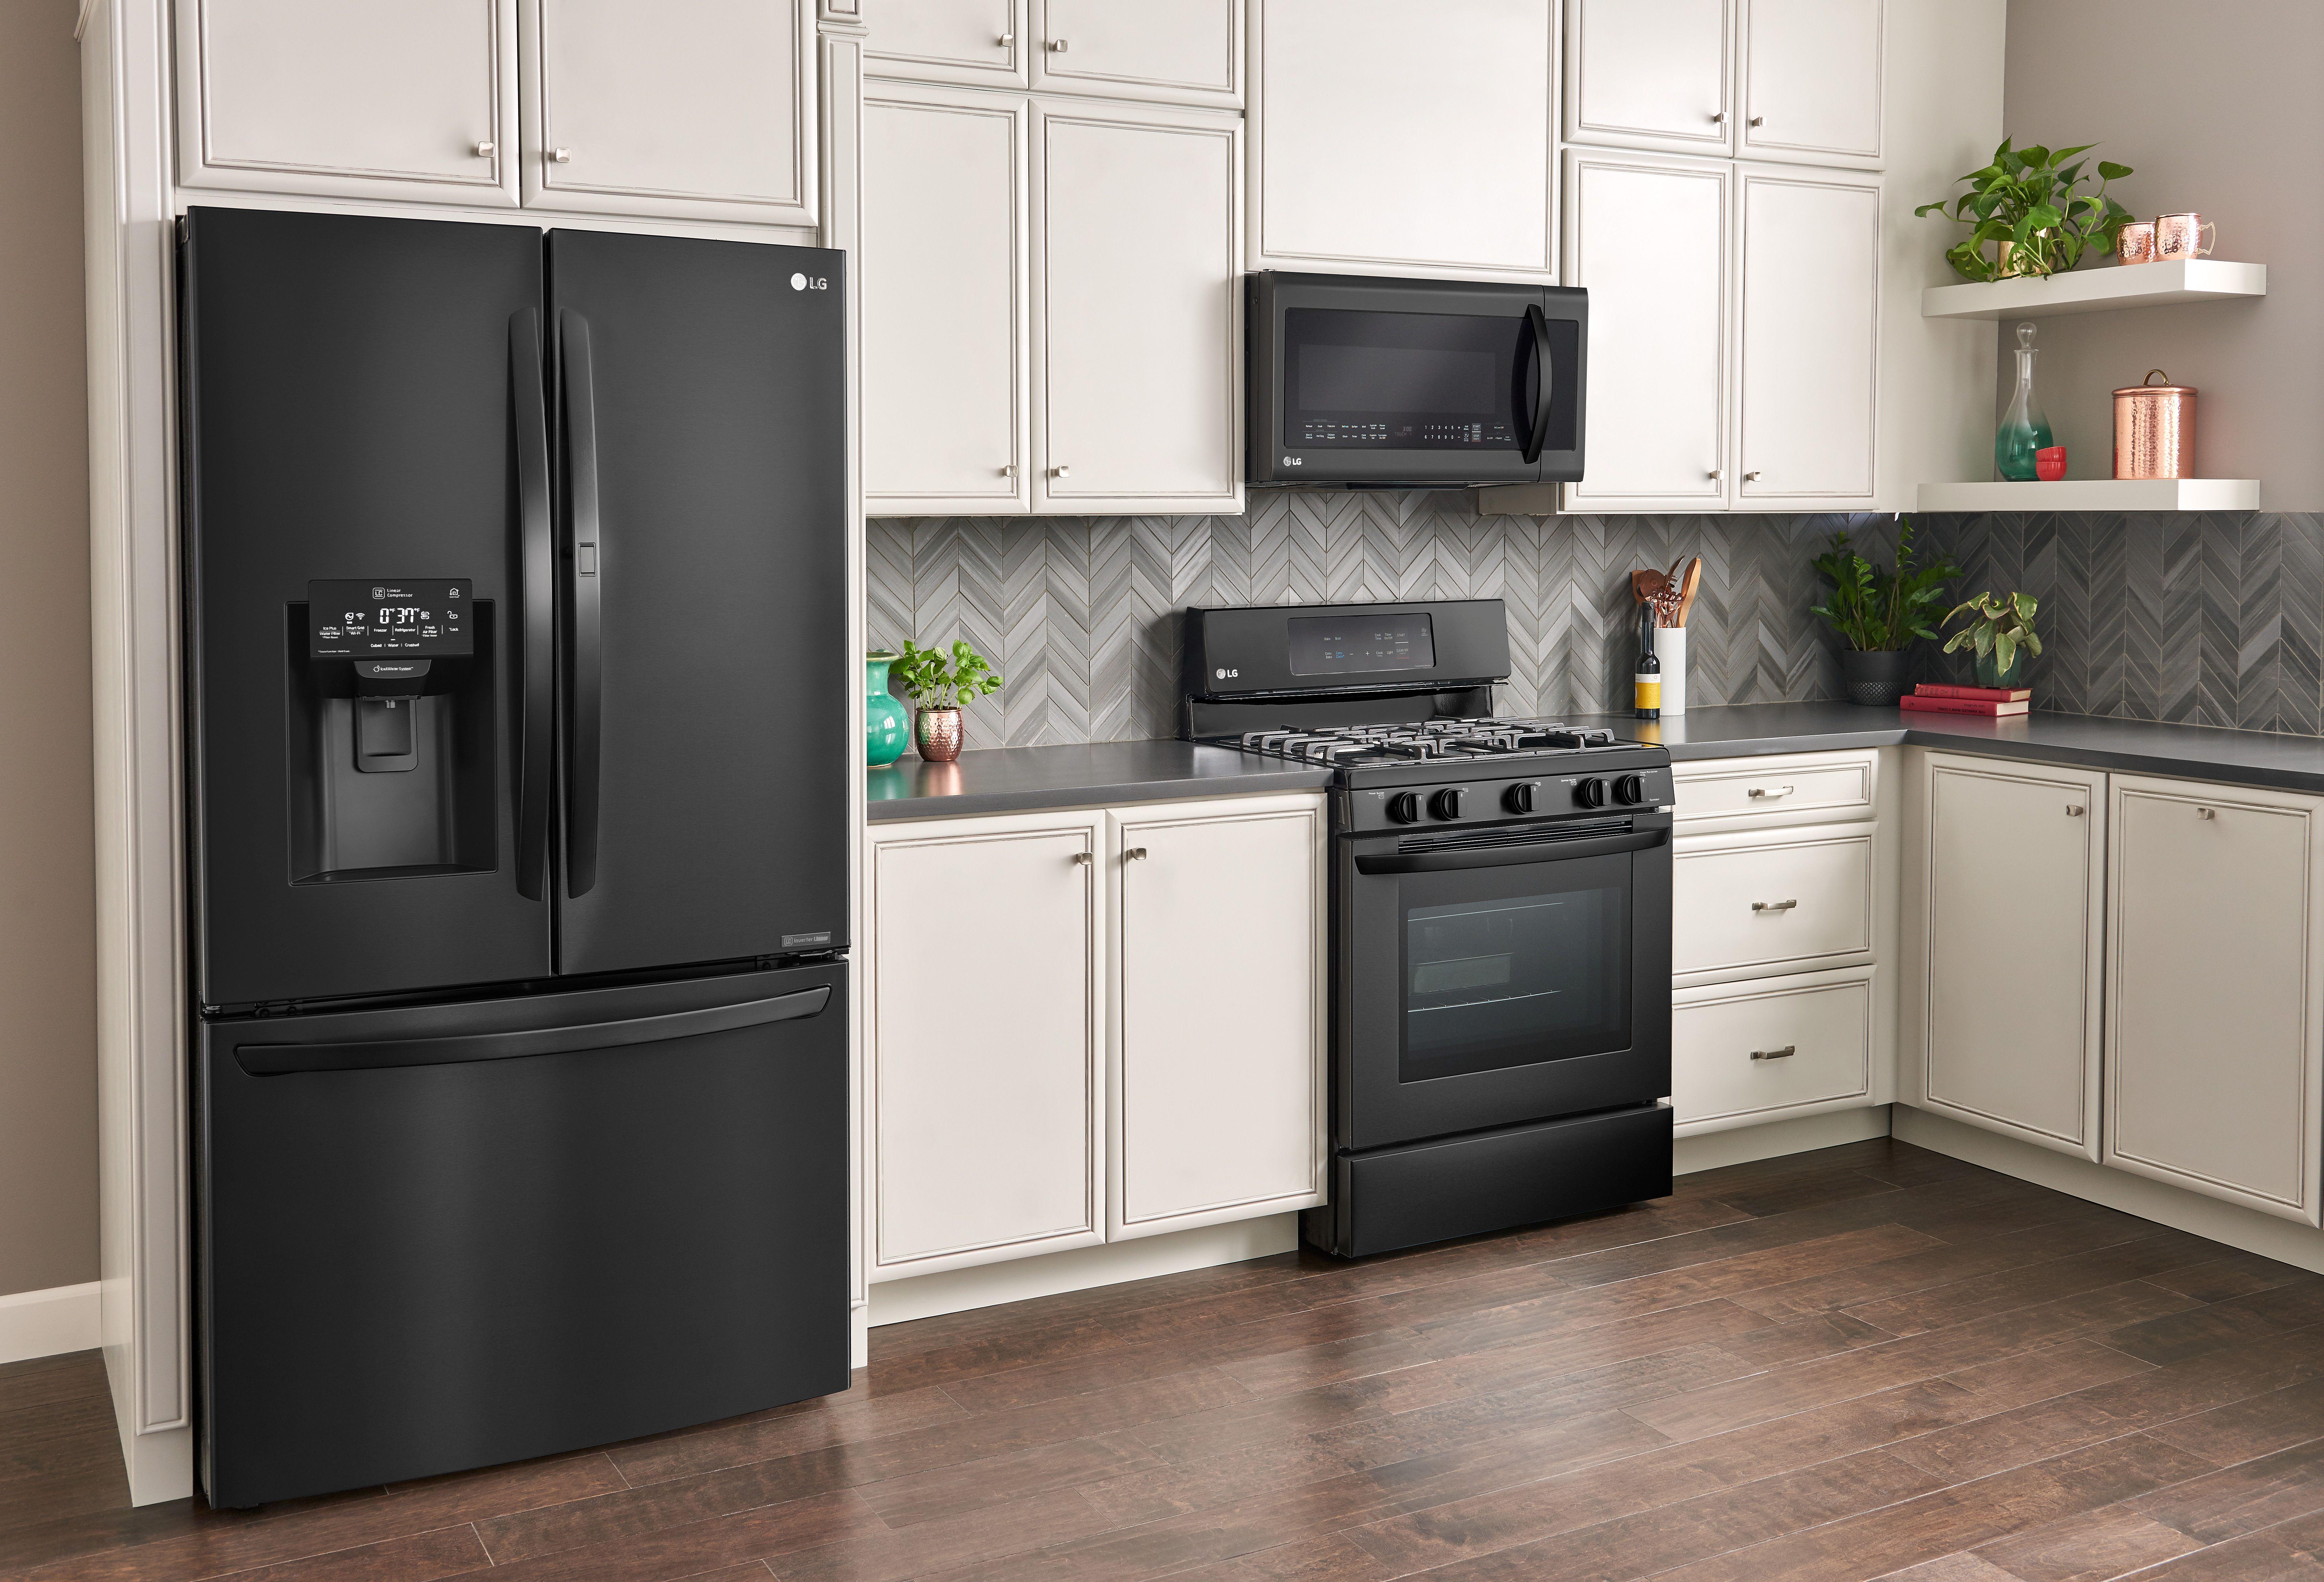 My Dream Lg Matte Black Kitchen Bestbuy Lgus Ad Shabby Chic Boho Black Appliances Kitchen Matte Black Kitchen Appliances White Cabinets